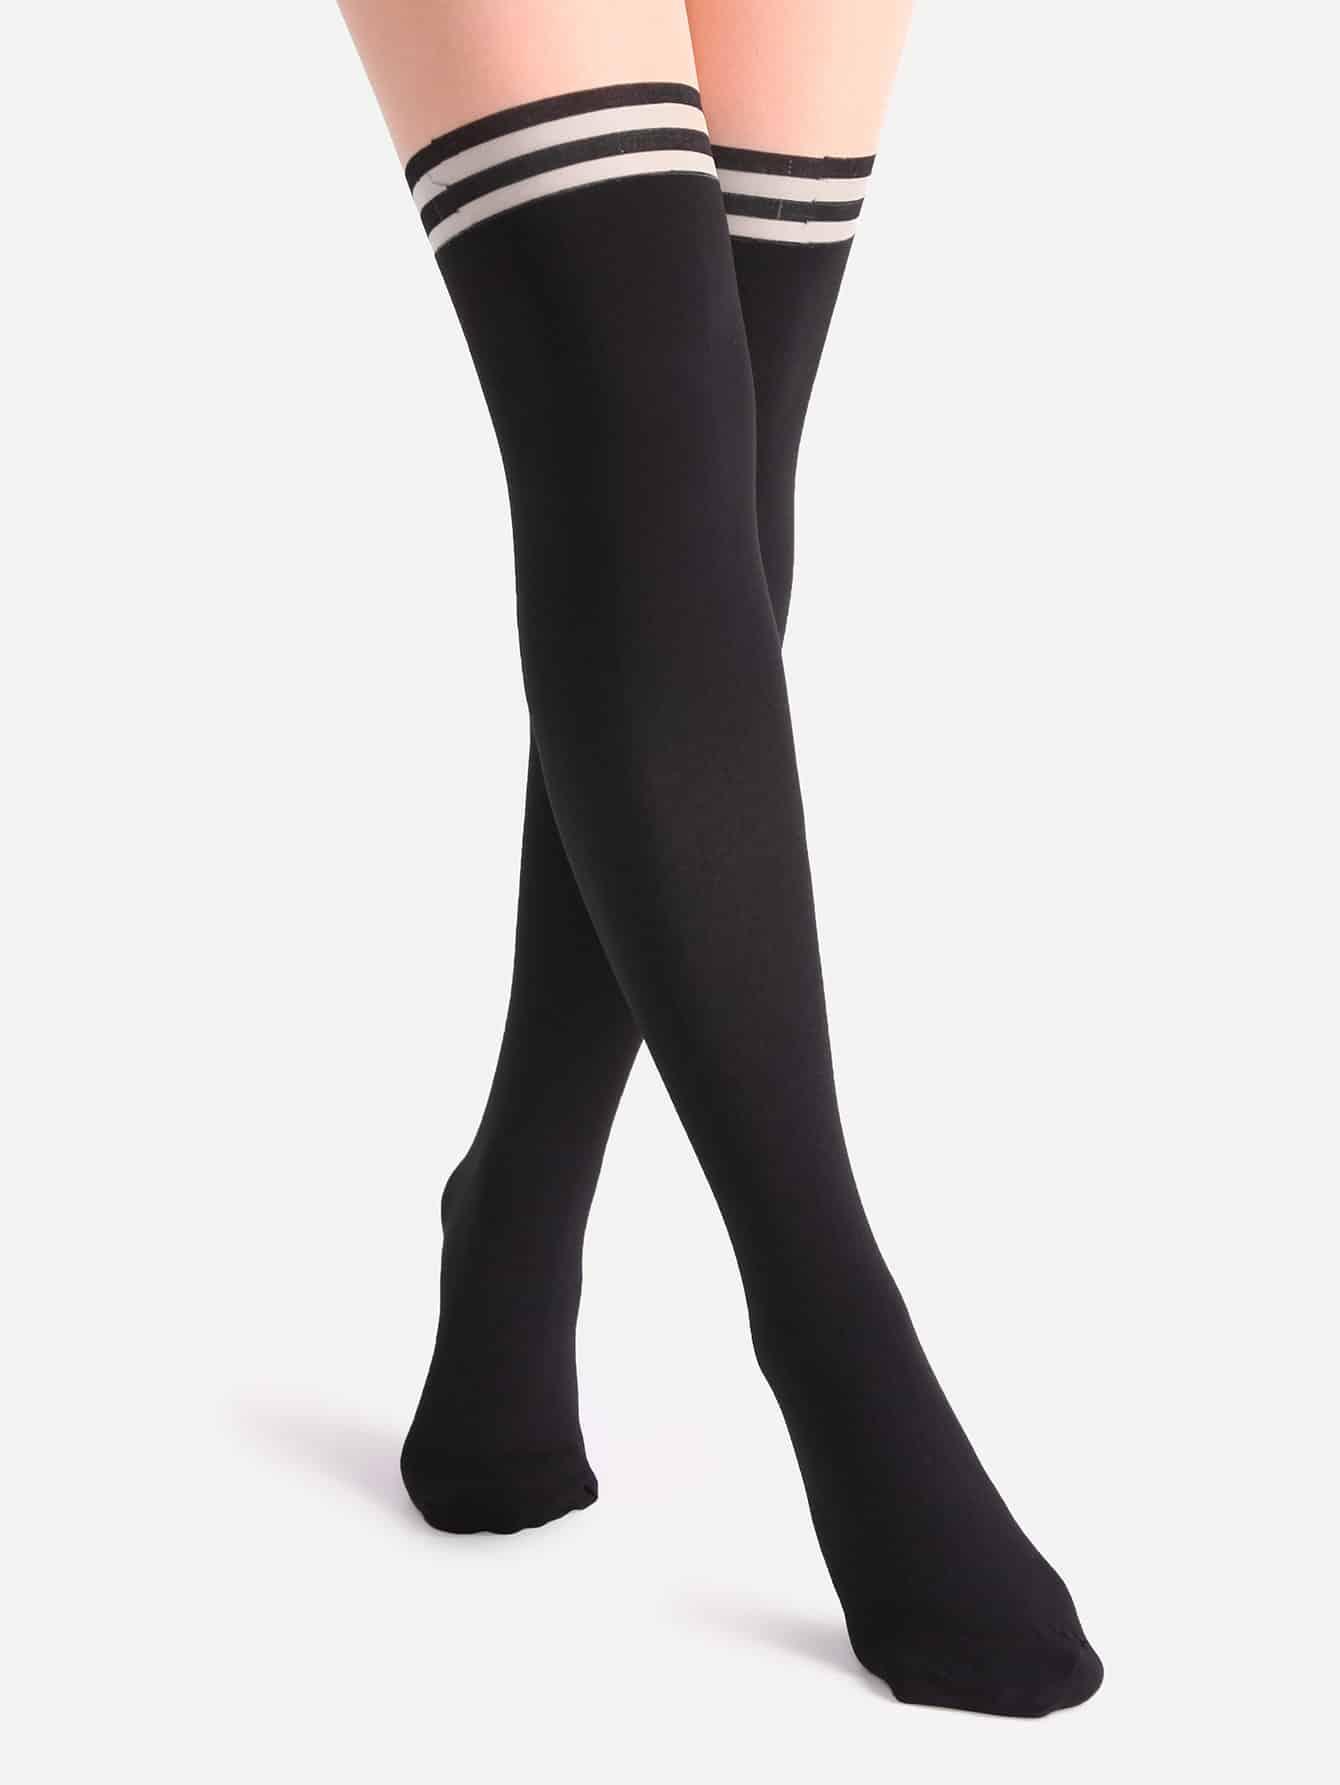 Black And Nude Patchwork Striped Pantyhose Stockings mesh design pantyhose stockings